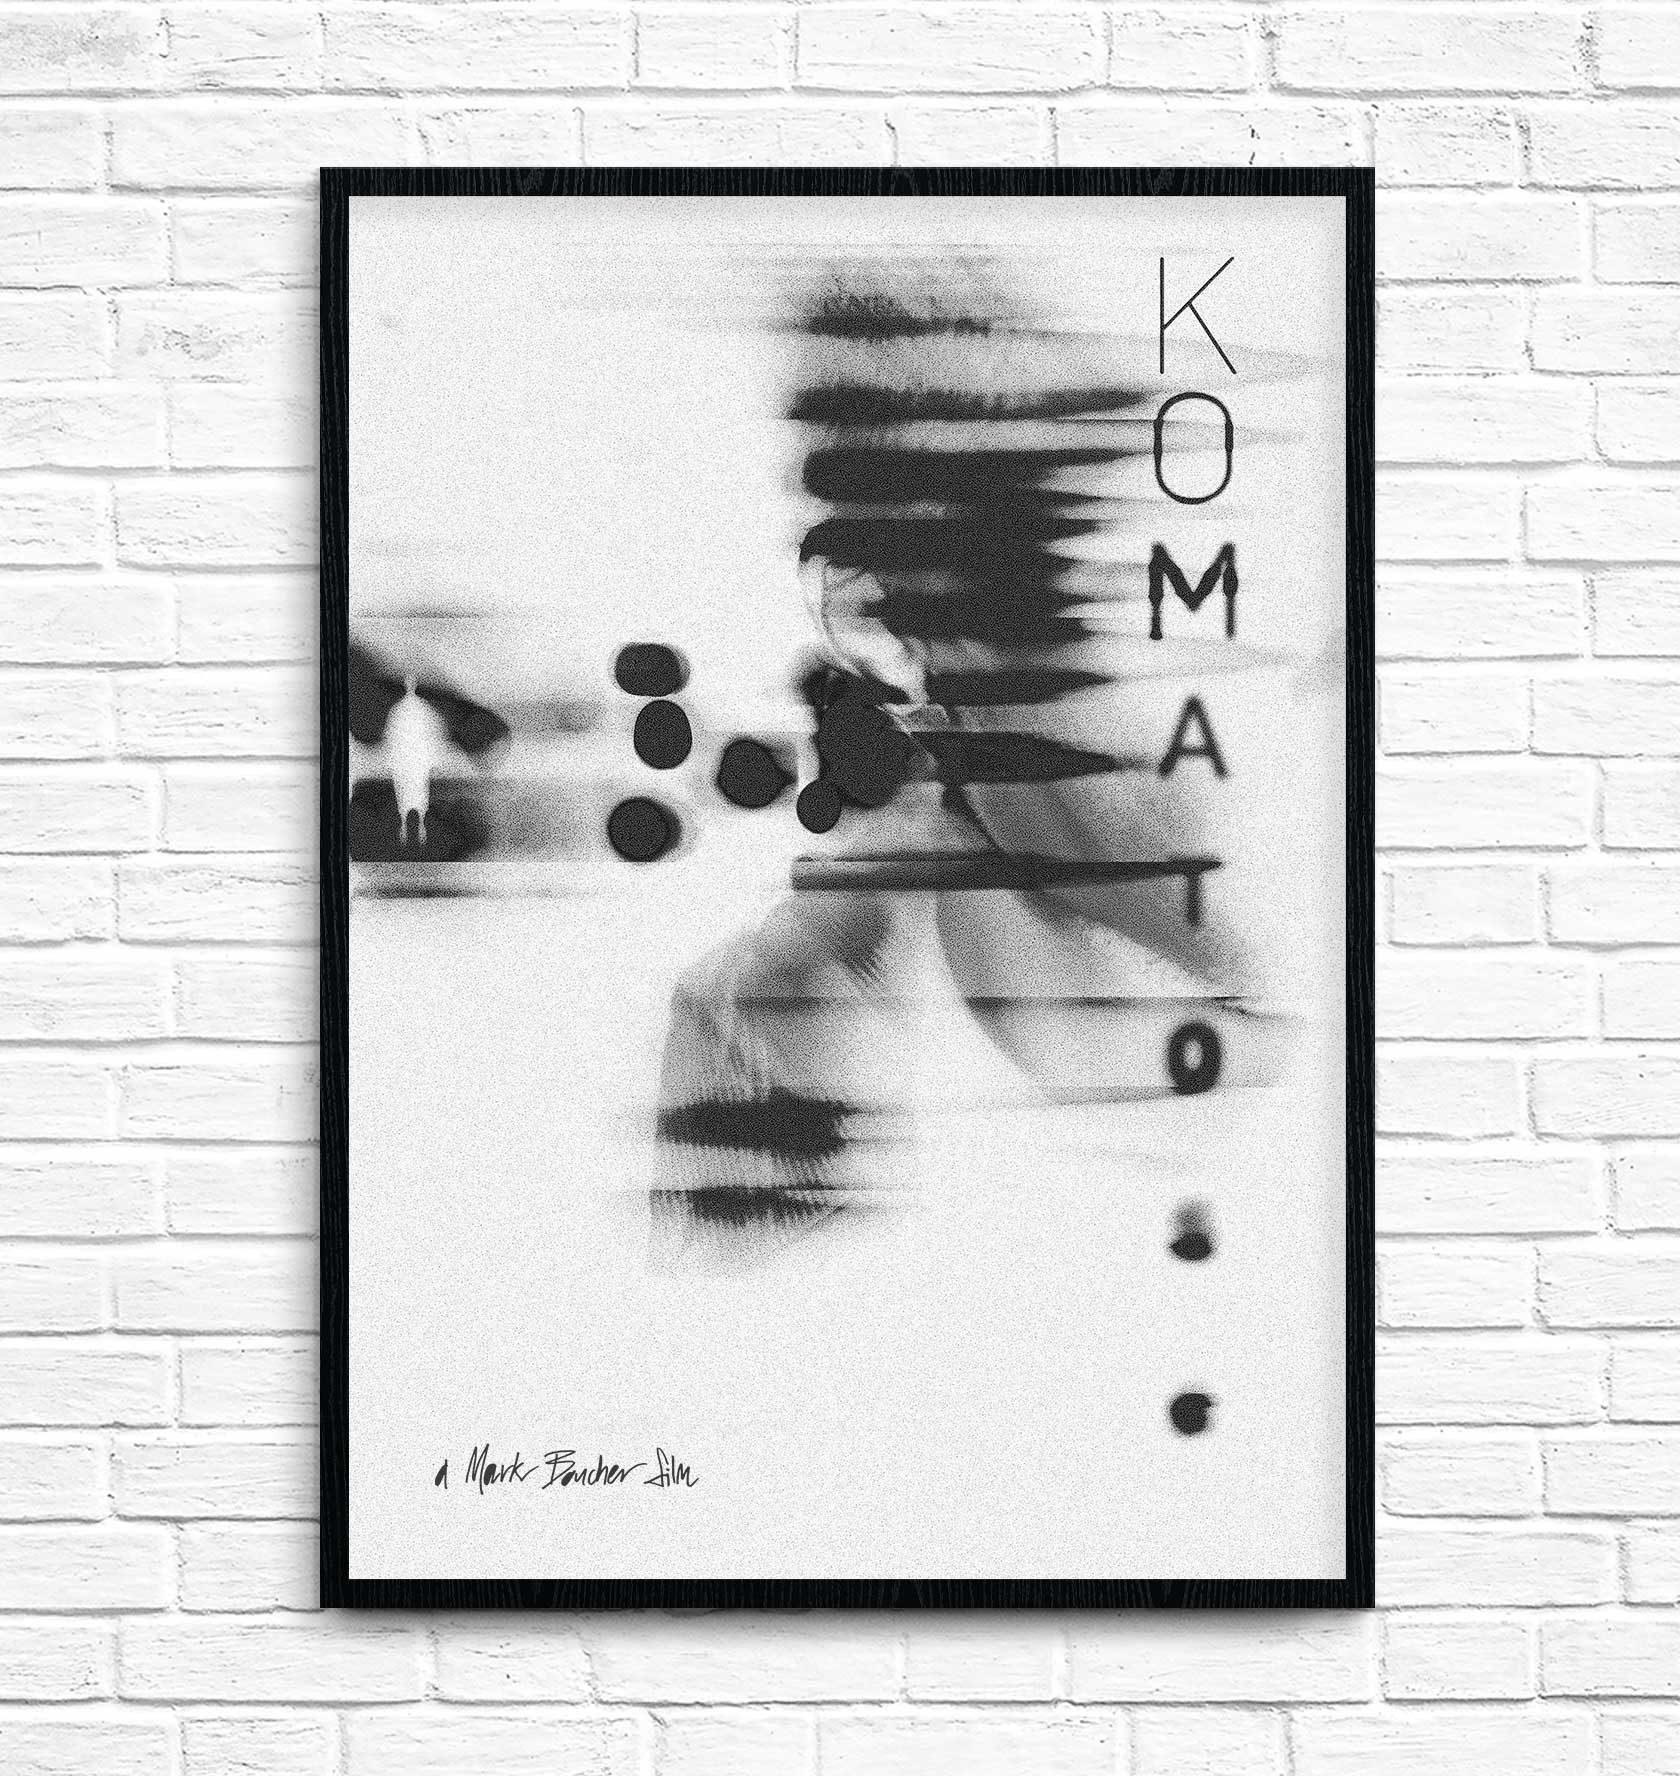 Komatose Film Poster 4 by Furia